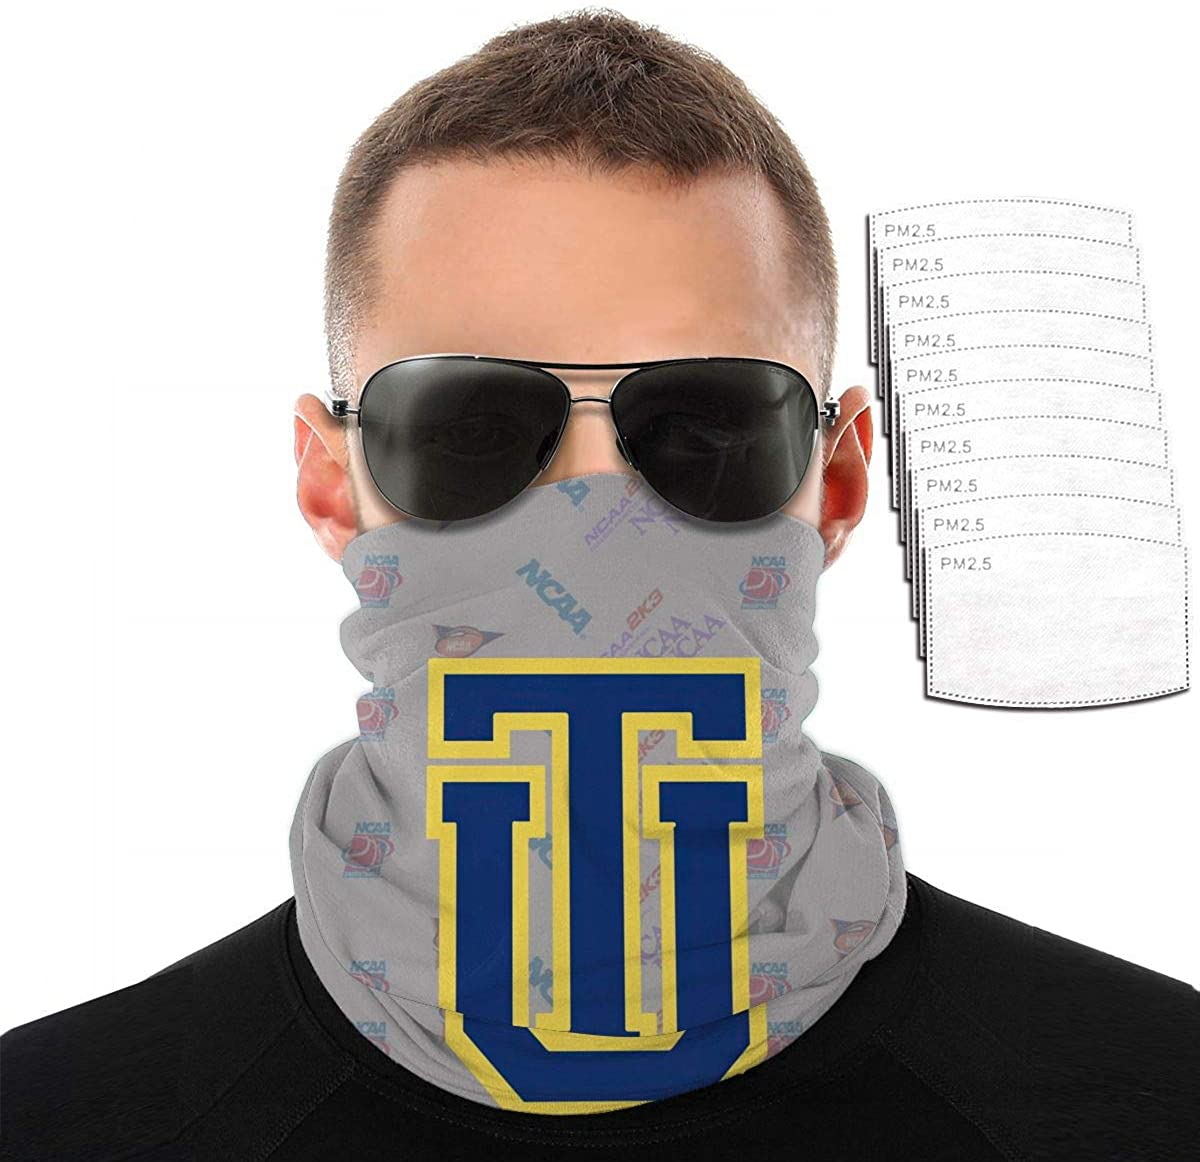 NACC Mask College Team Logo Funny Neck Warmer Men Women Neck Gaiter Elastic Seamless Face Mask Headband Bandana for Outdoor Sport With Filters- Tulsa Golden Hurricane